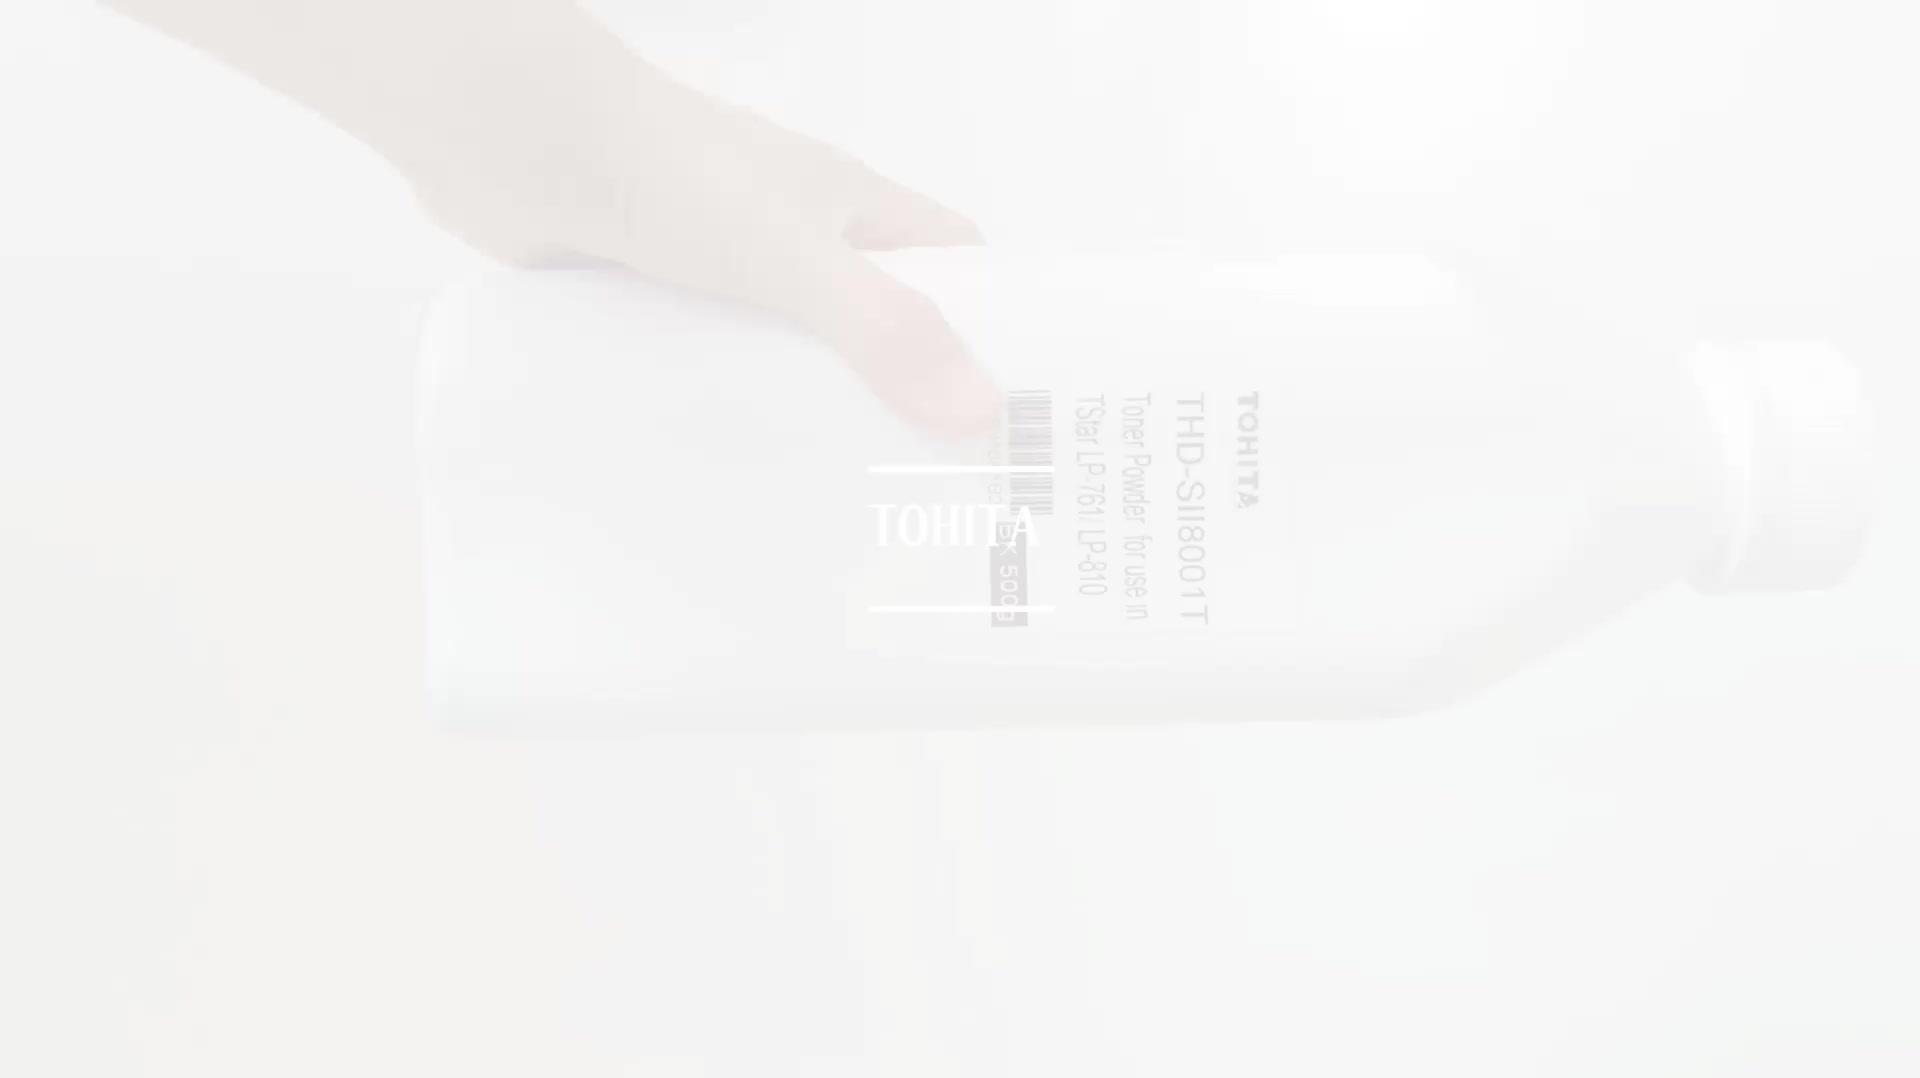 Original quality toner powder of TOHITA LP-810 810 LP-761 761 for TerioStar LP1010 1010 1020 1120 toner powder